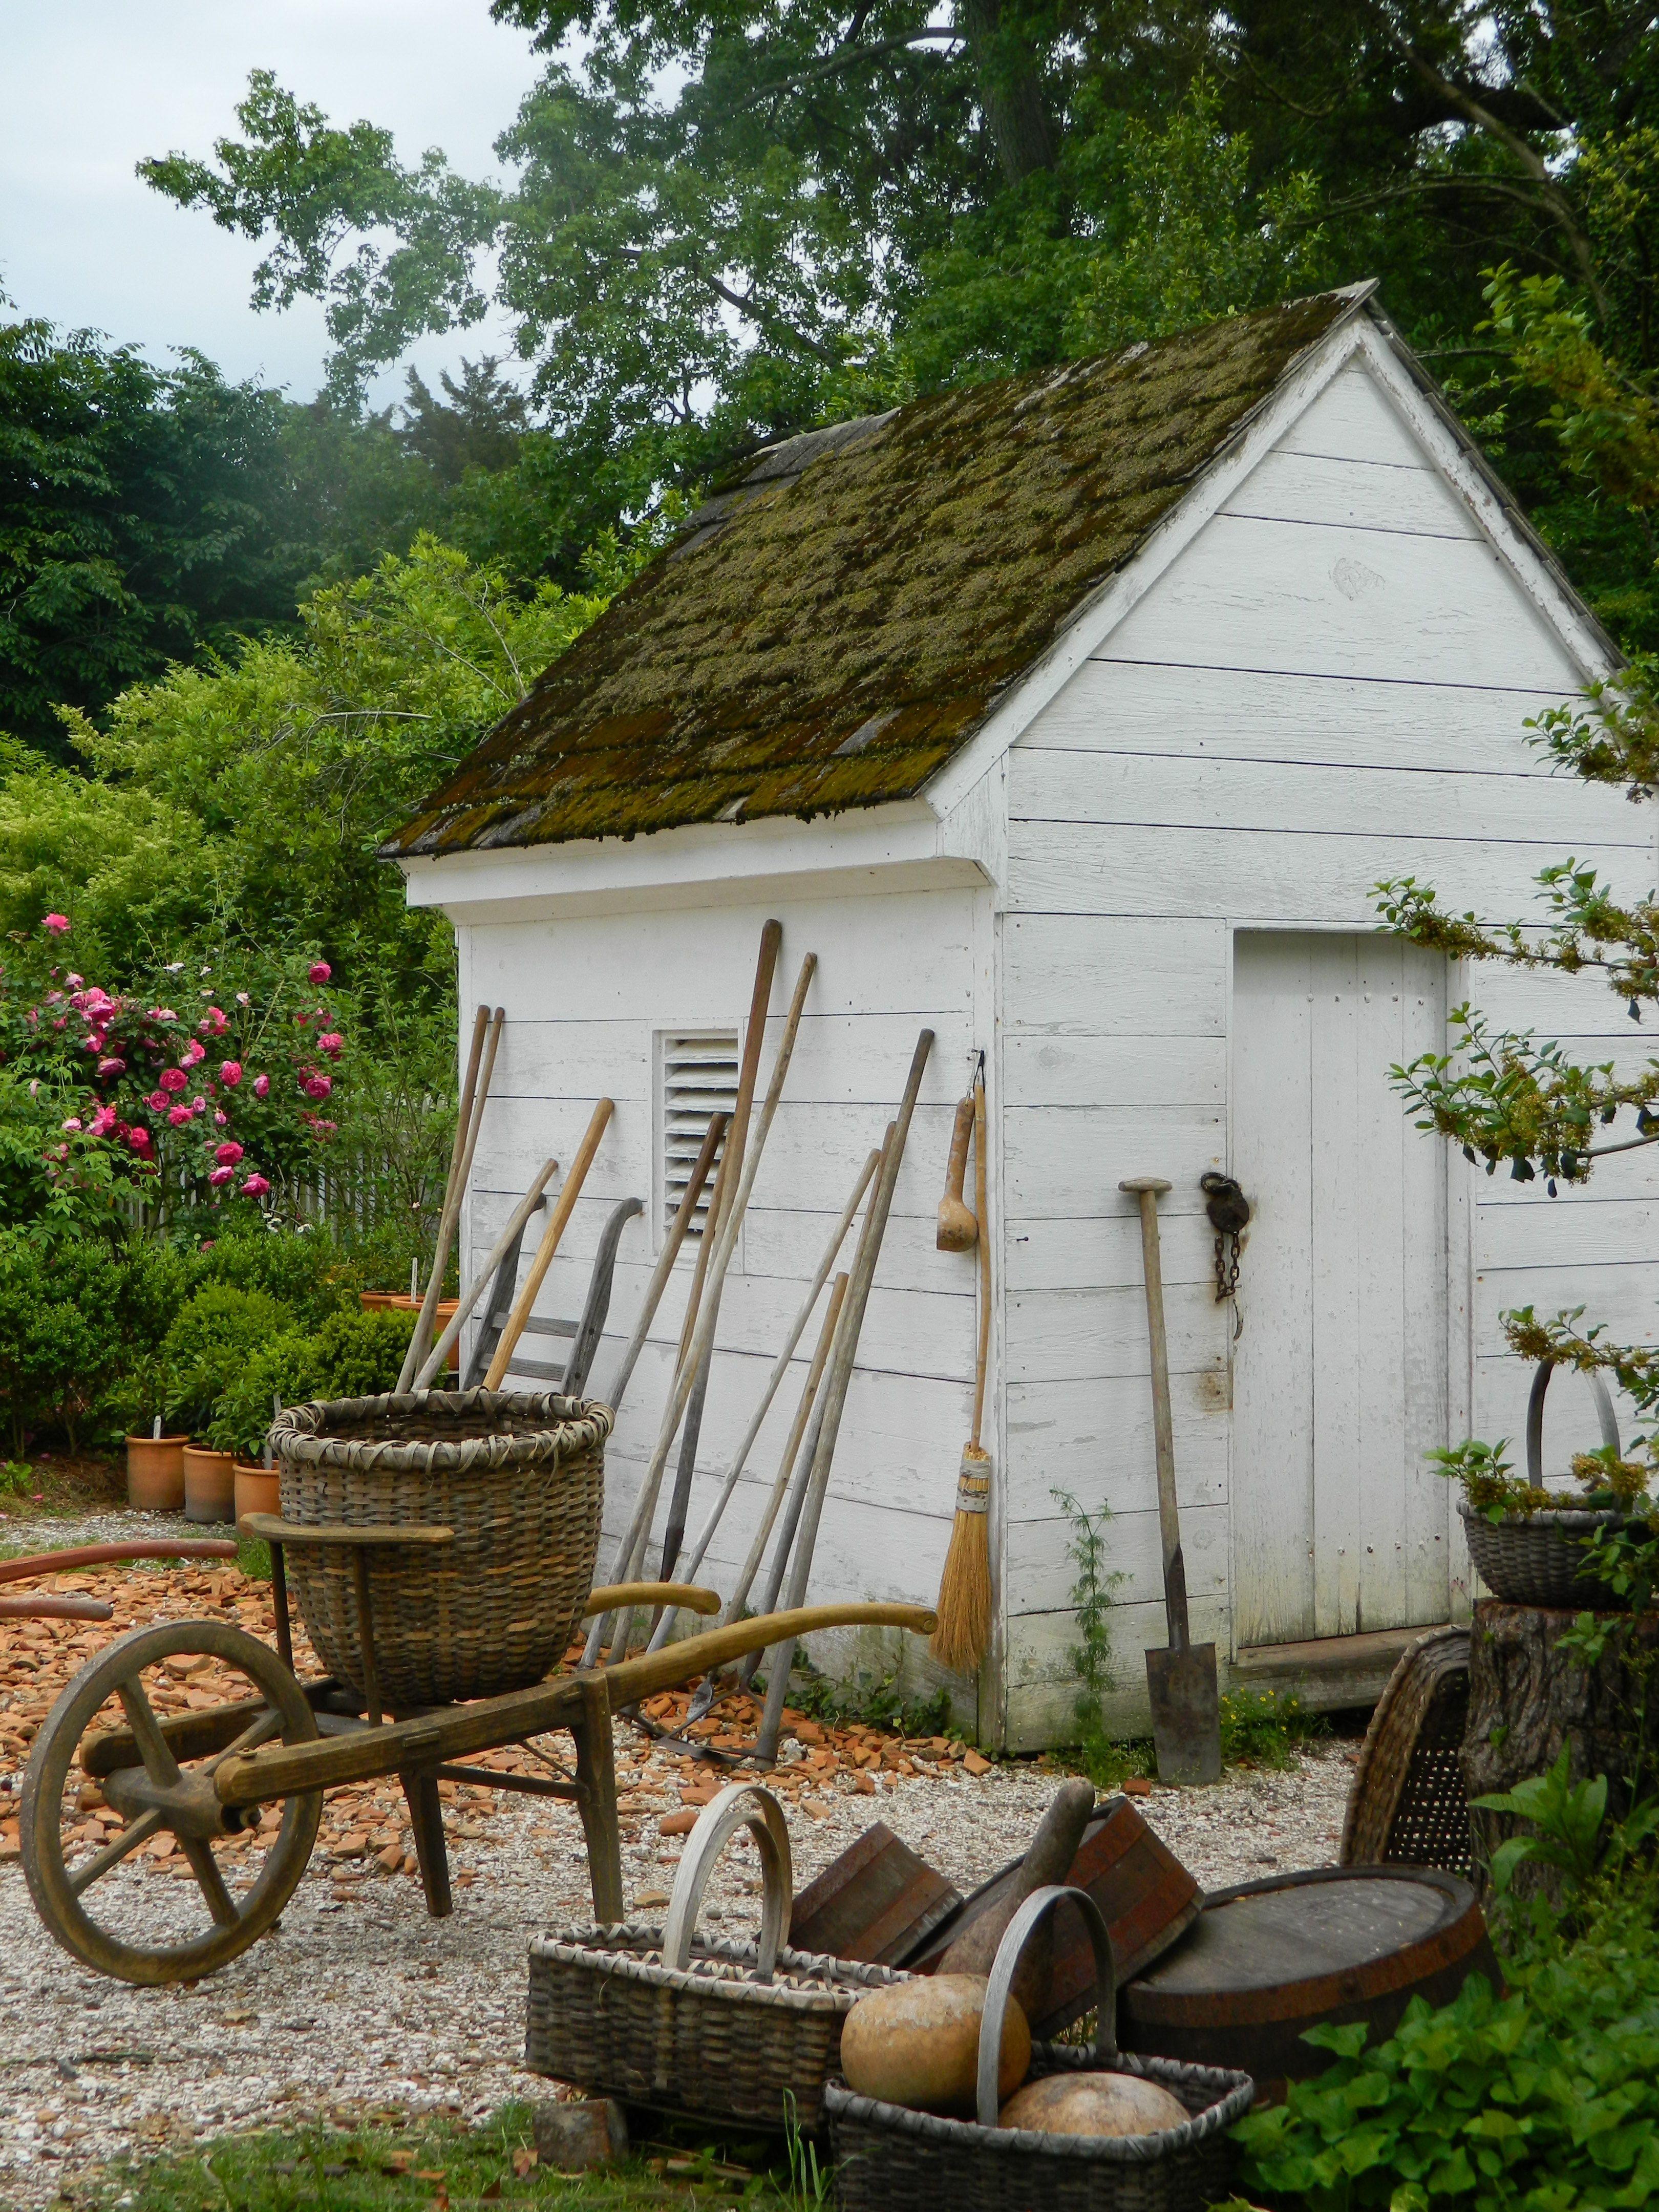 abri de jardin blanc abris de jardin en bois pinterest jardins potager et cabane jardin. Black Bedroom Furniture Sets. Home Design Ideas